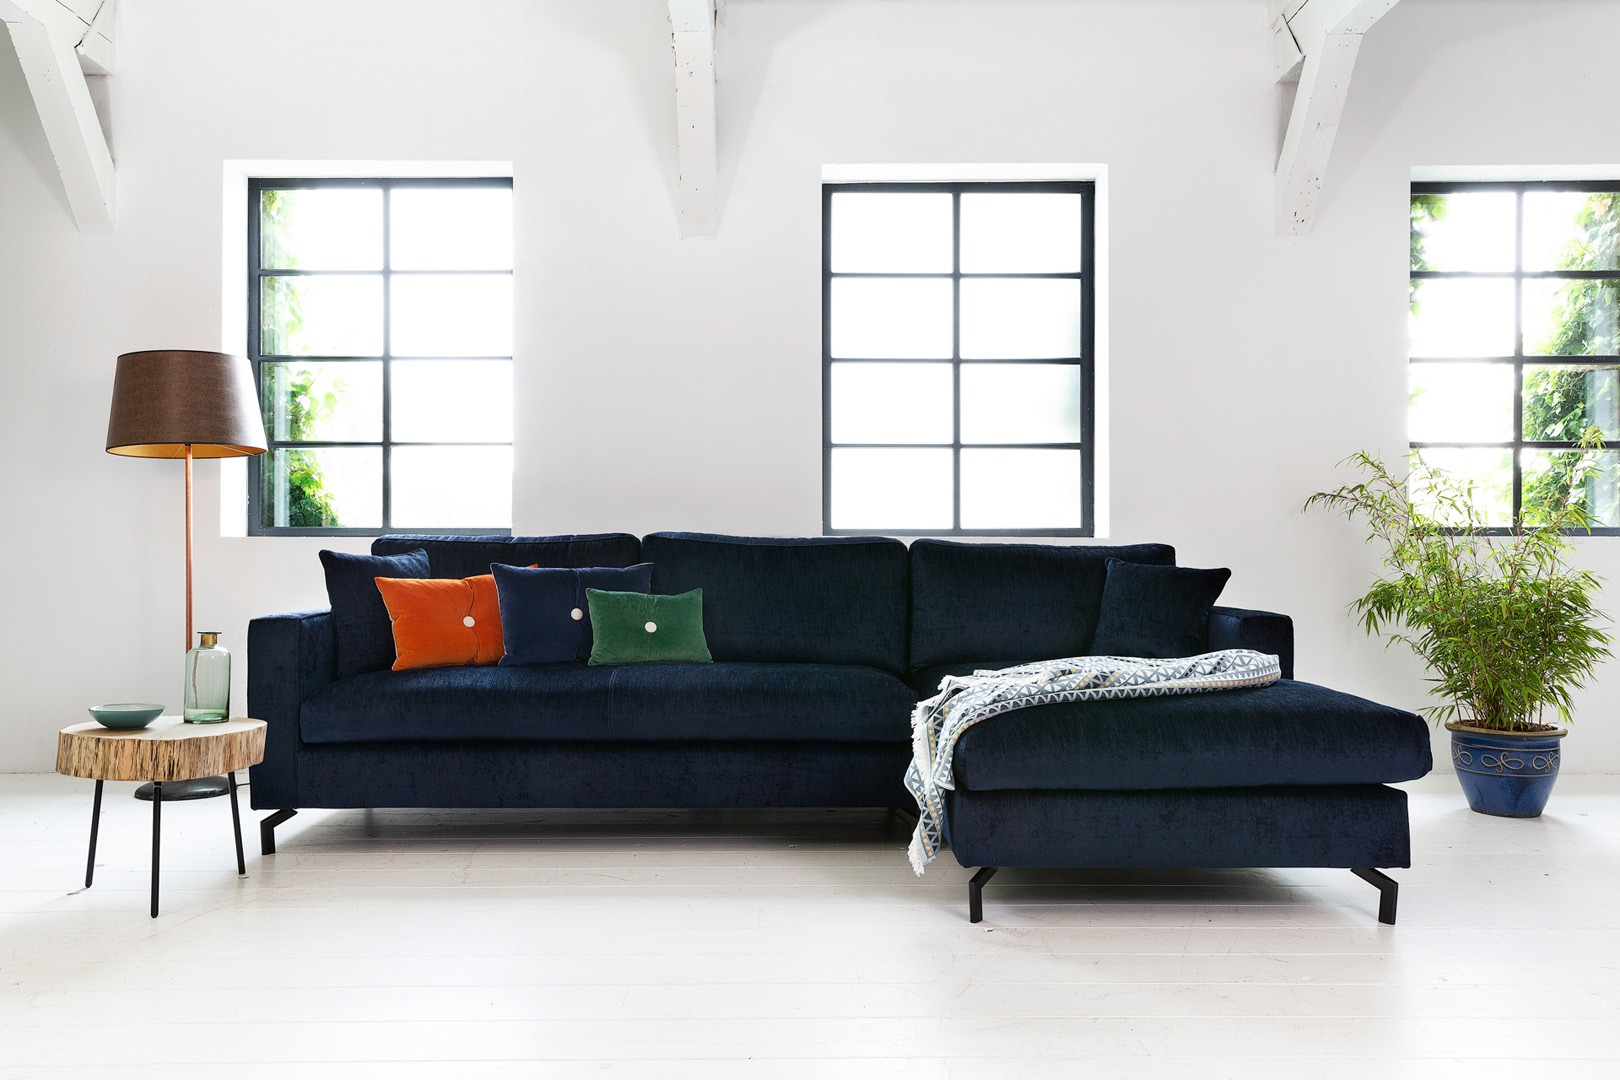 Romantic-paris-hoekbank-met-ottoman-blauw-stof-soofs-interieur-